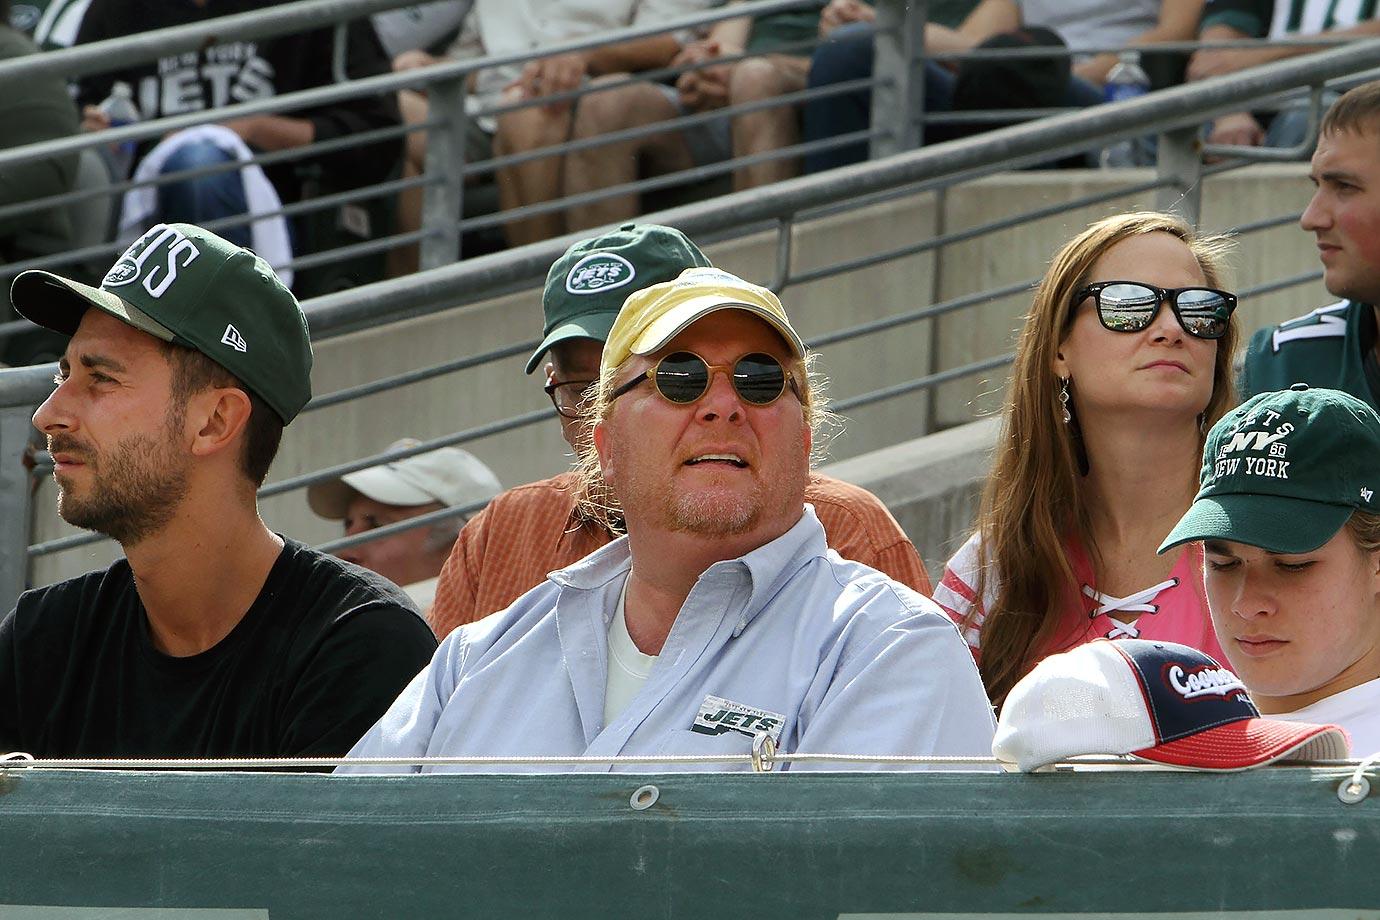 New York Jets vs. Philadelphia Eagles on Sept. 27, 2015 at MetLife Stadium in East Rutherford, N.J.